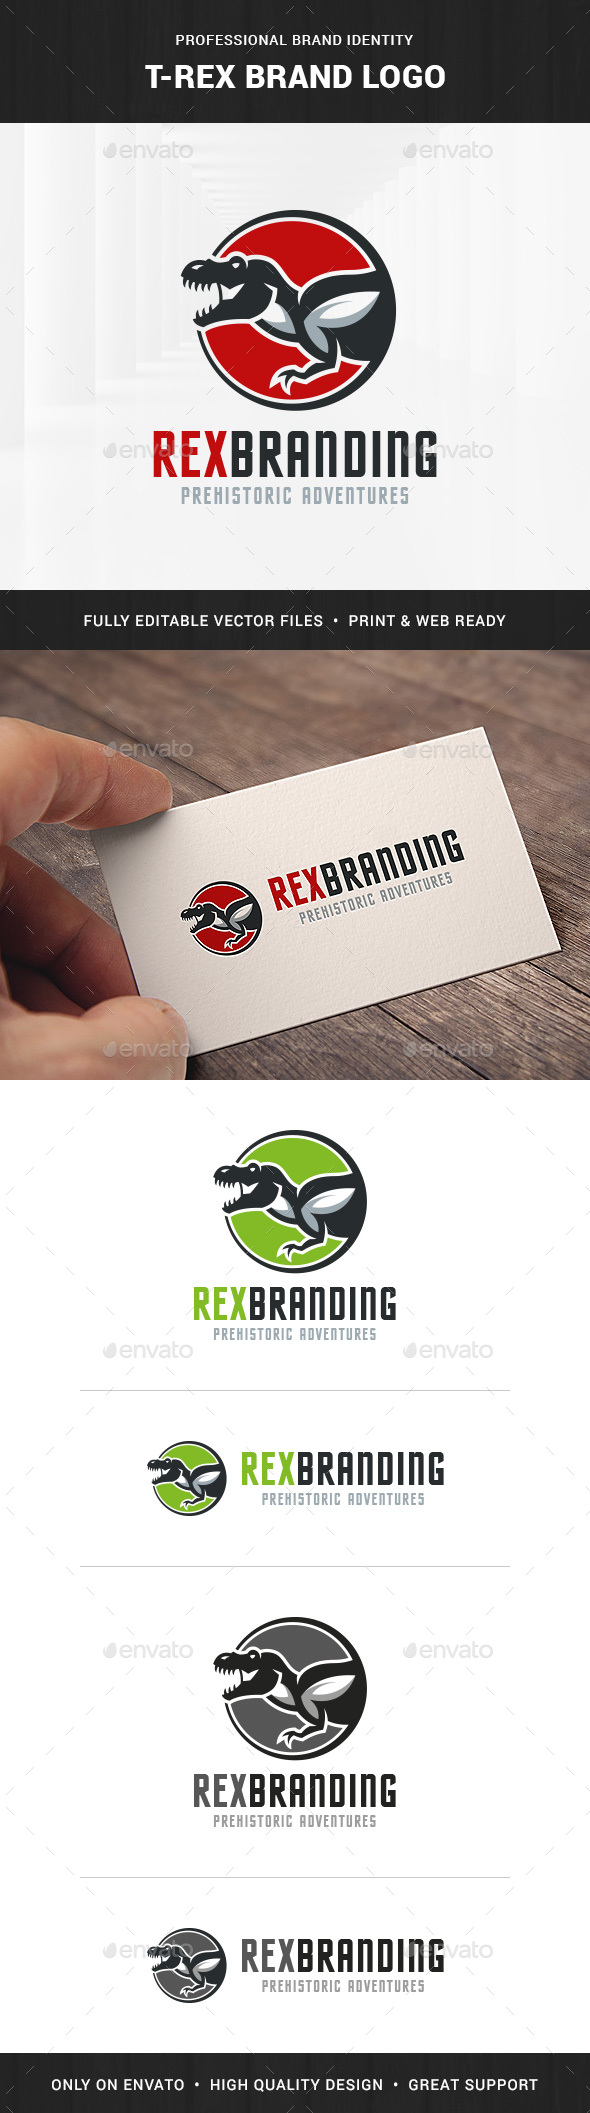 T-Rex Brand Logo Template - Animals Logo Templates